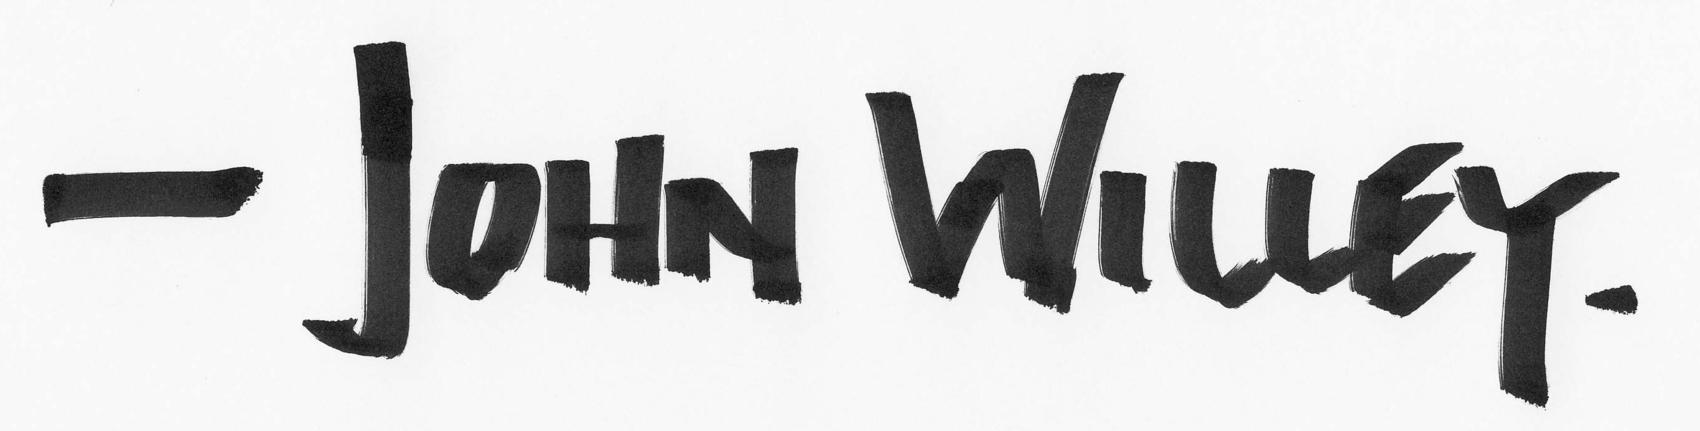 John-Willey-Signature.png